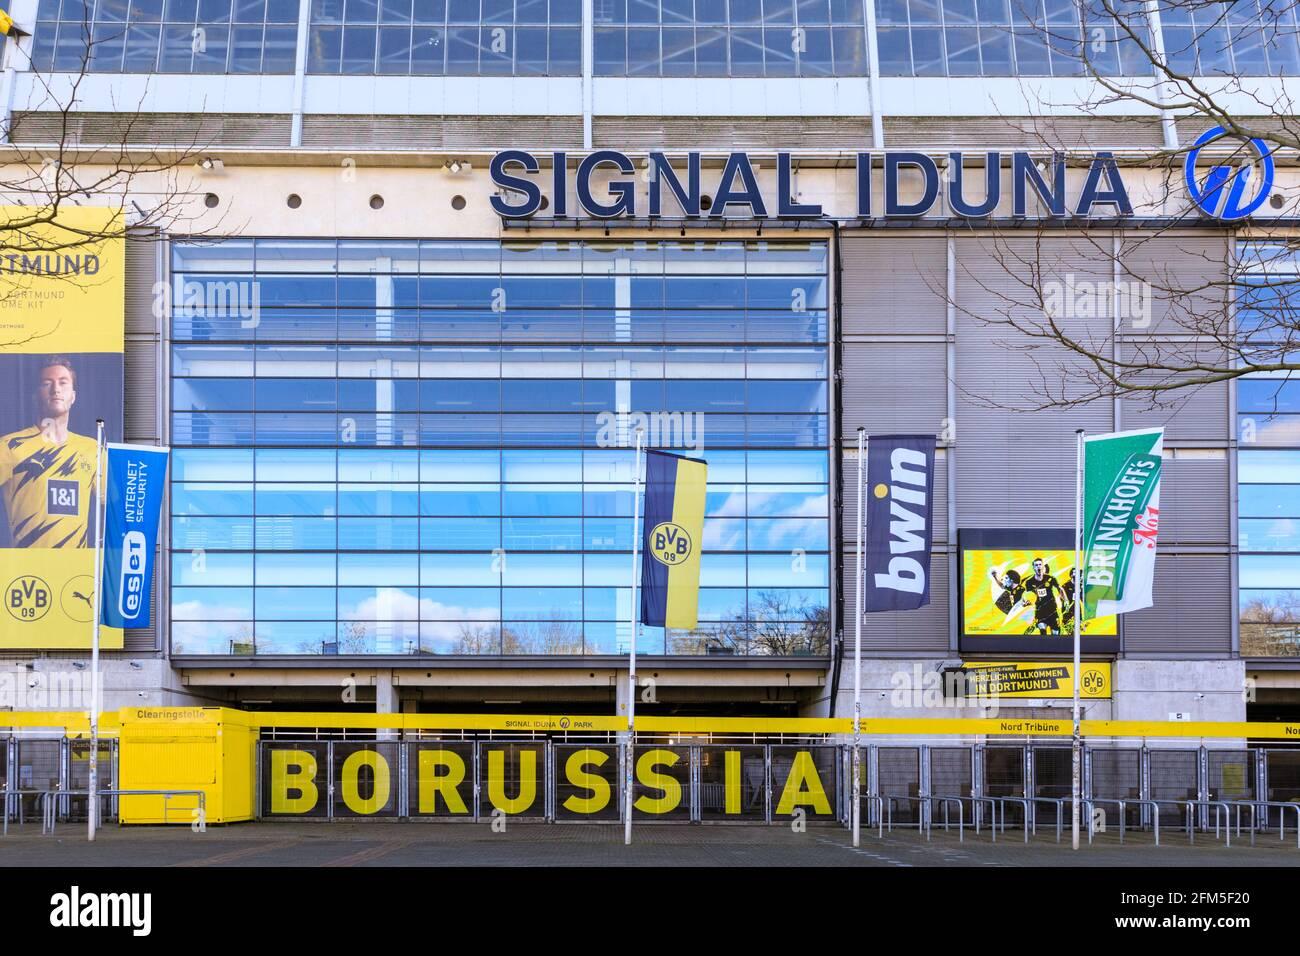 Signal Iduna Park, Borussia Dortmund football club BVB09 stadium arena front exterior, Dortmund, Germany Stock Photo